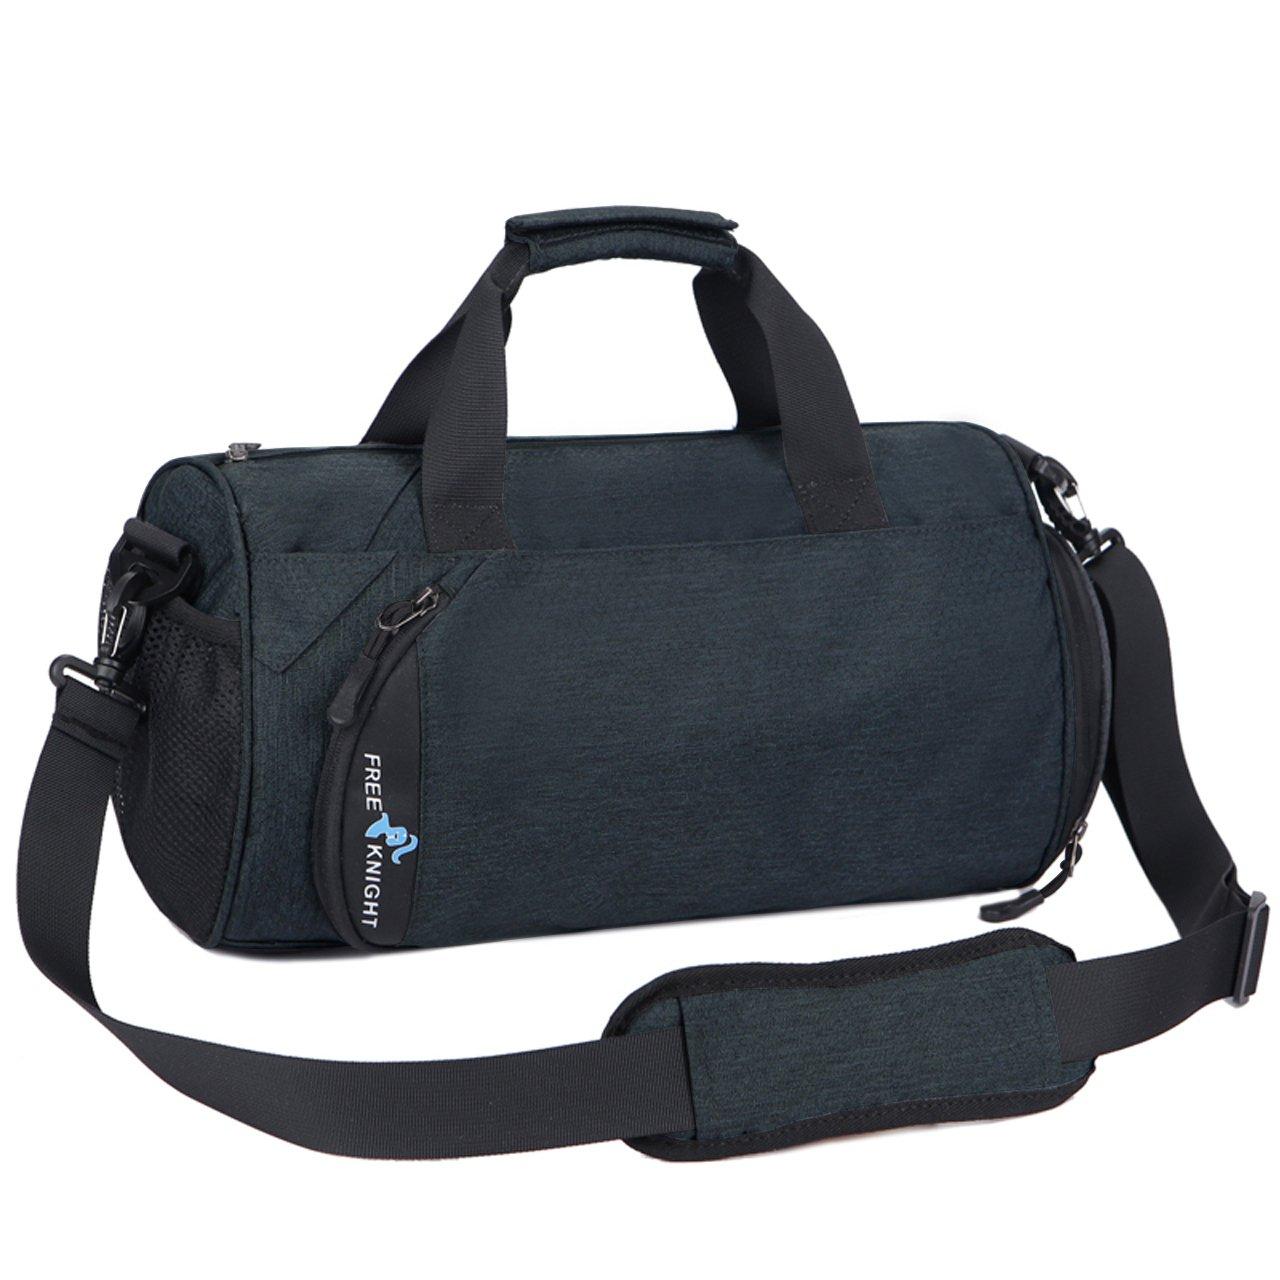 28c5856c9270da Galleon - Faleto Canvas Sport Duffel Bag Gym Tote Bag With Shoe Compartment  Fitness Yoga Equipment Bag Waterproof For Men & Women (Dark Grey)